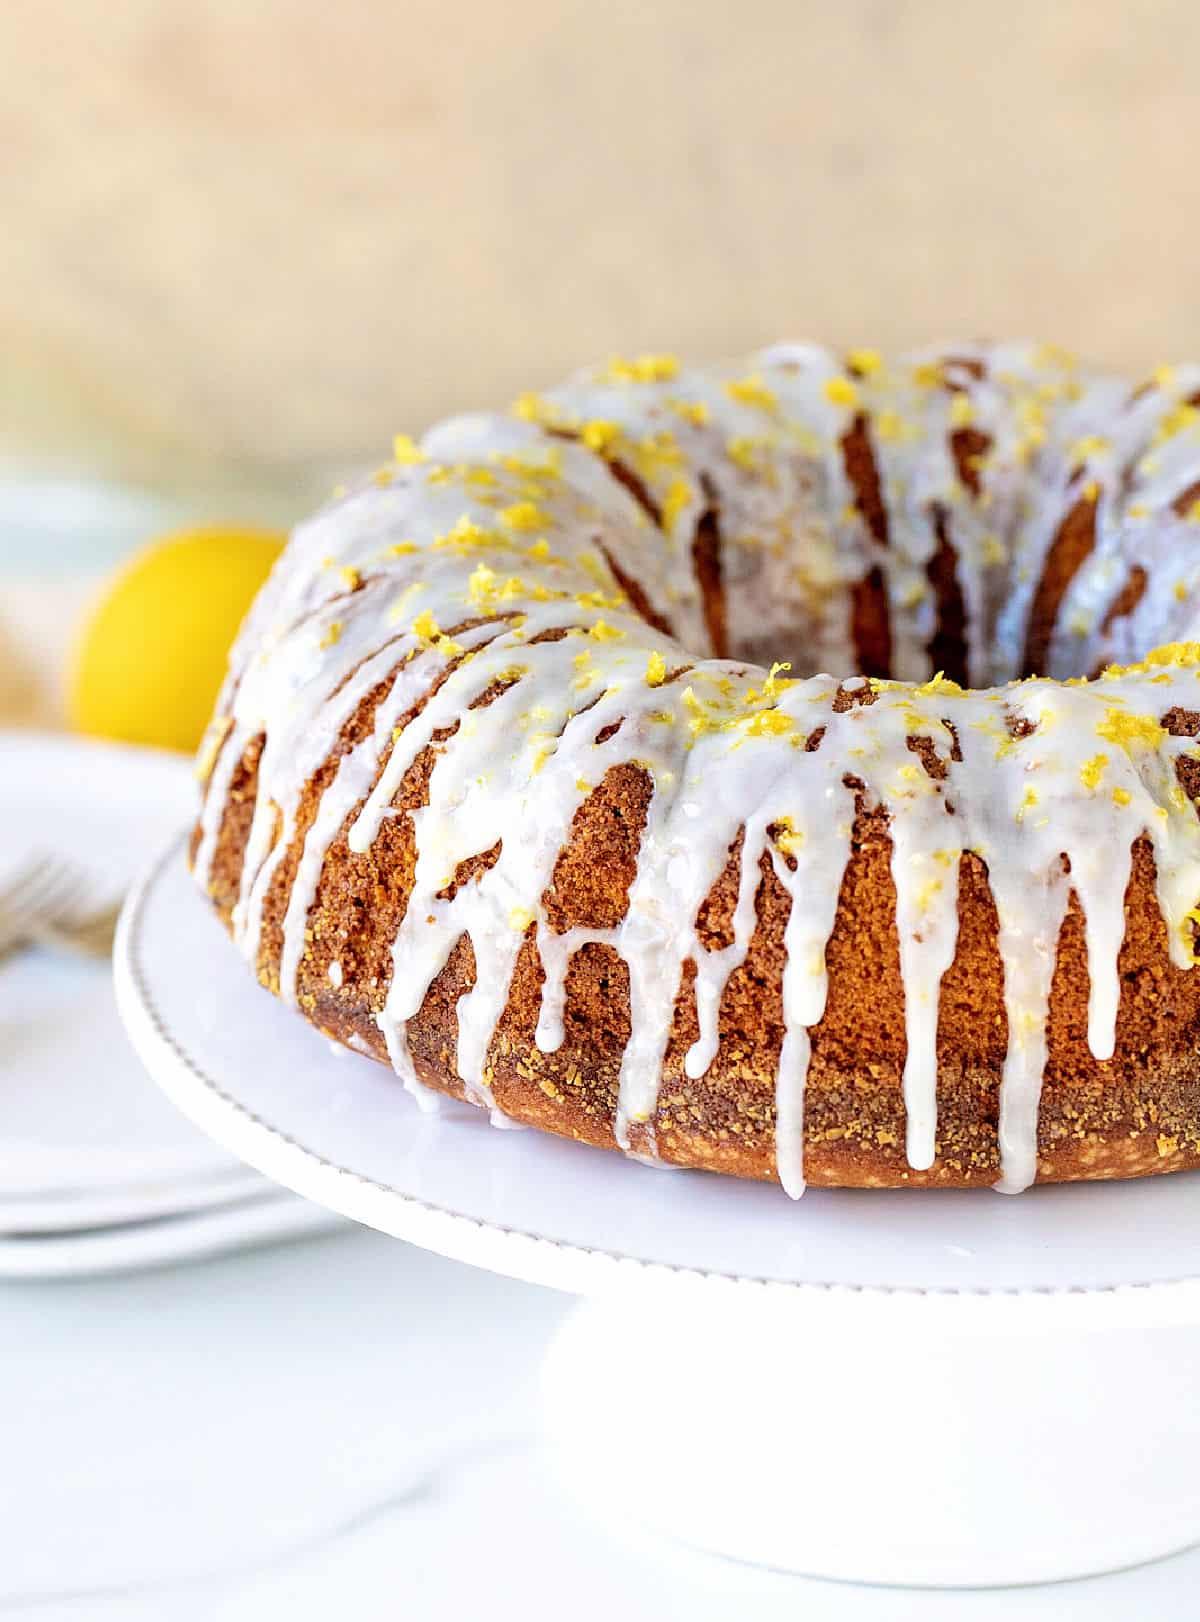 Partial view of glazed lemon bundt cake on white cake stand, beige background